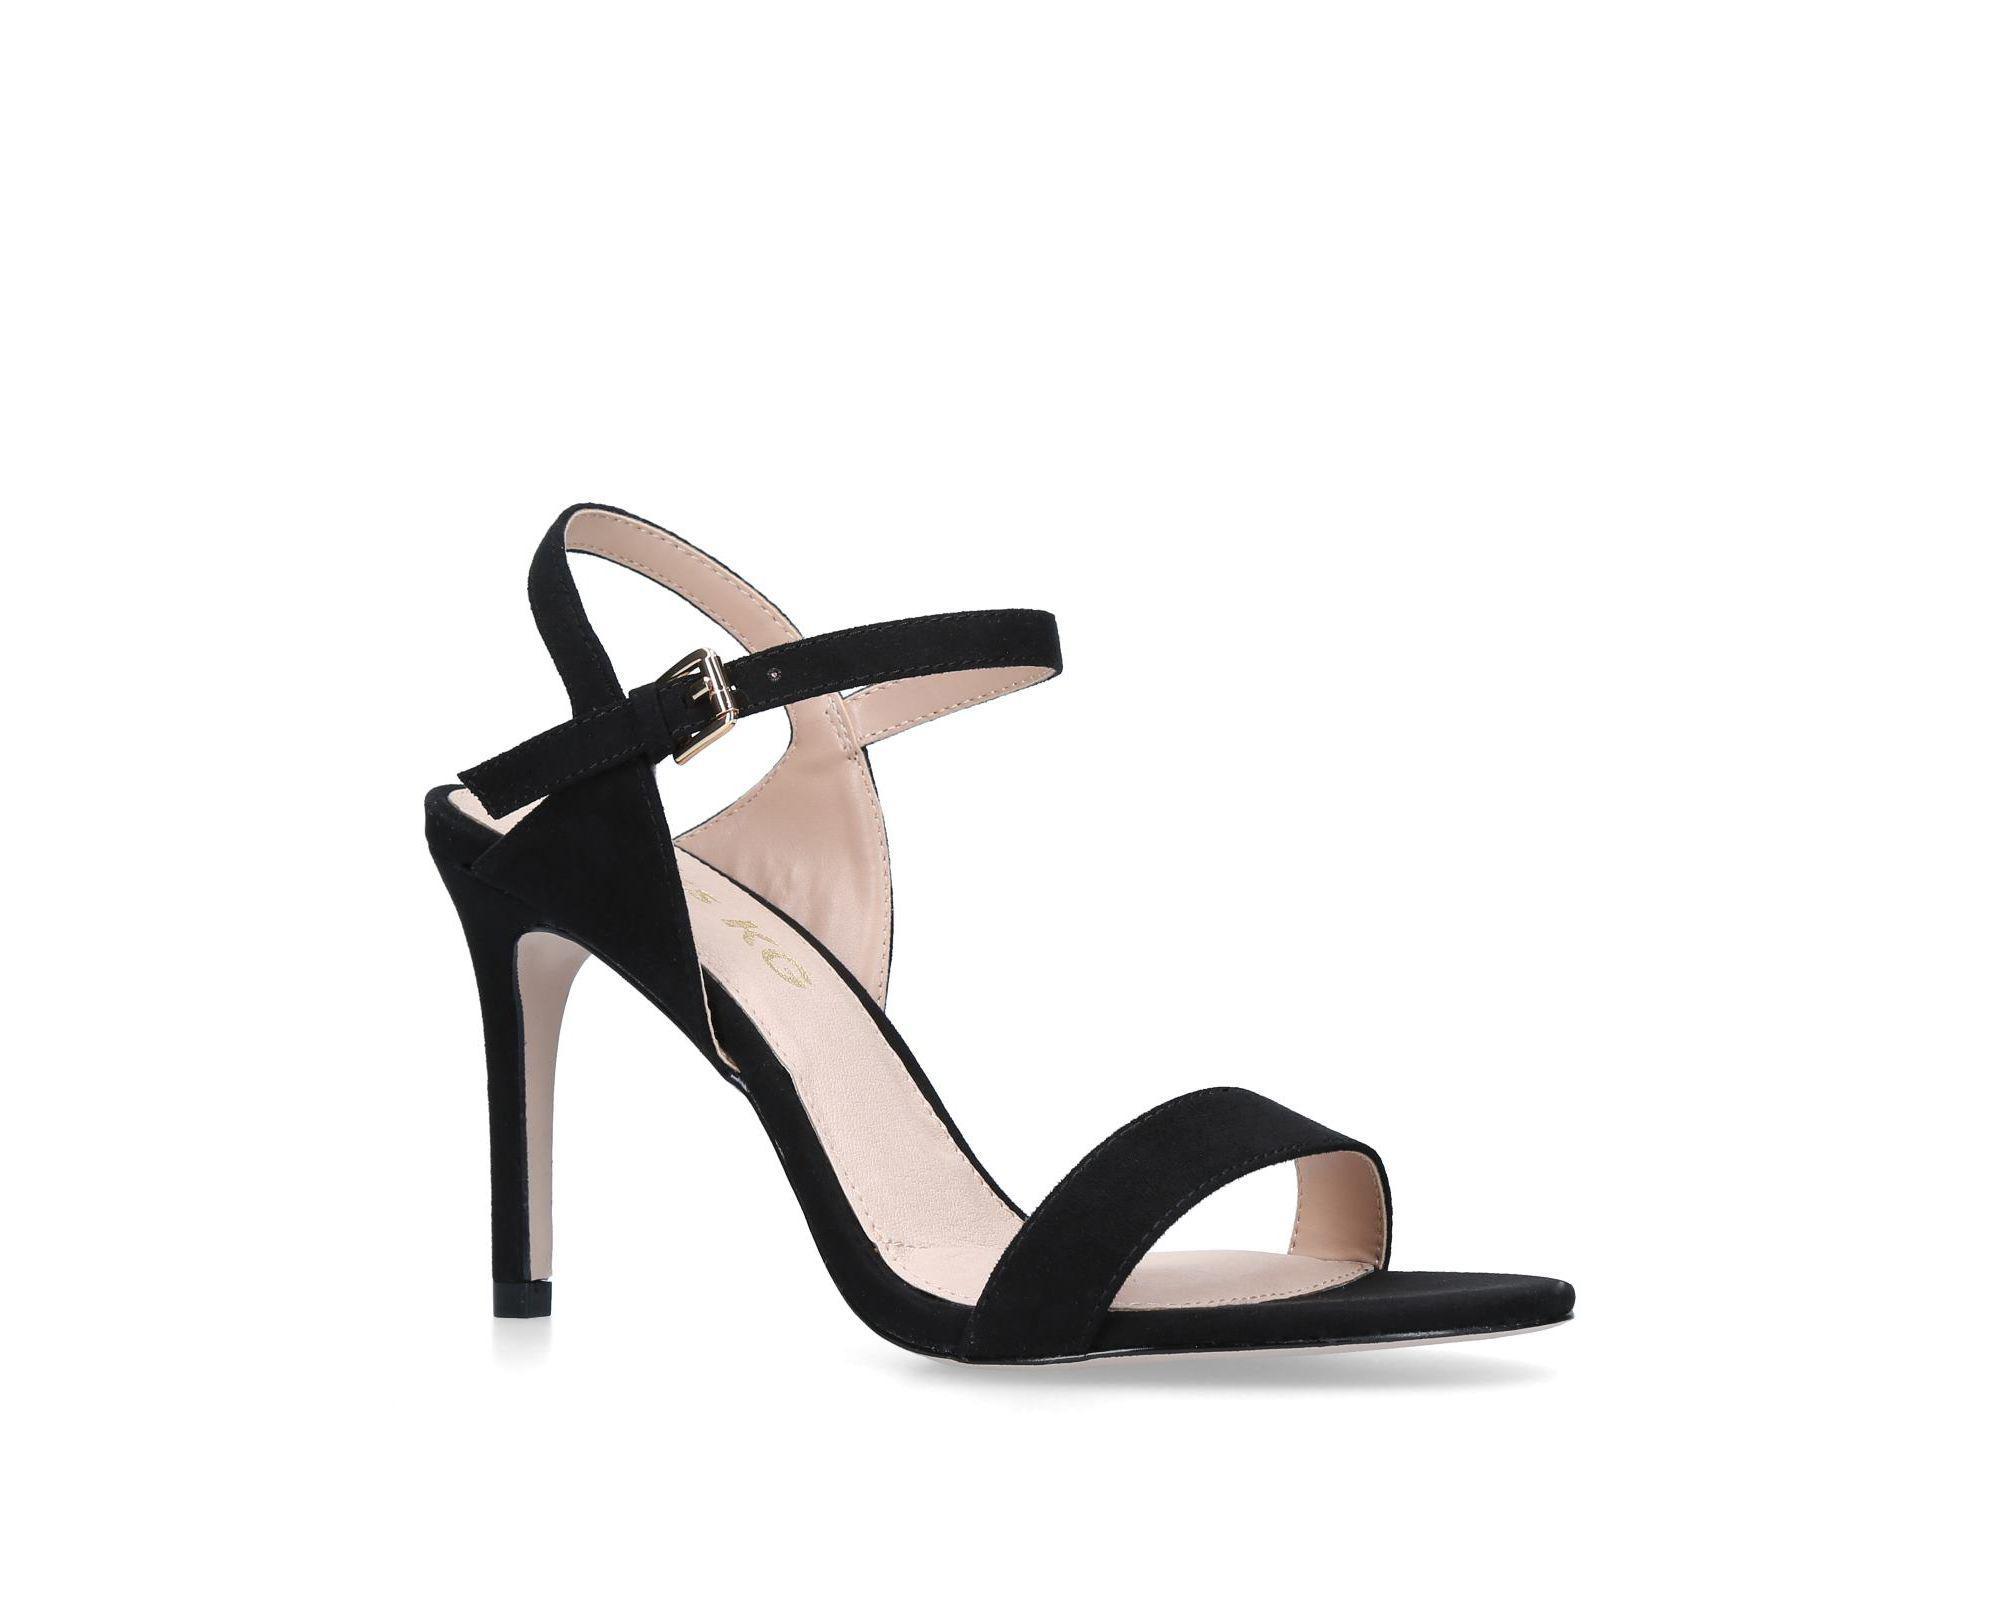 bd7d93e83be Miss Kg - Black  poppy  Mid Heel Sandals - Lyst. View fullscreen